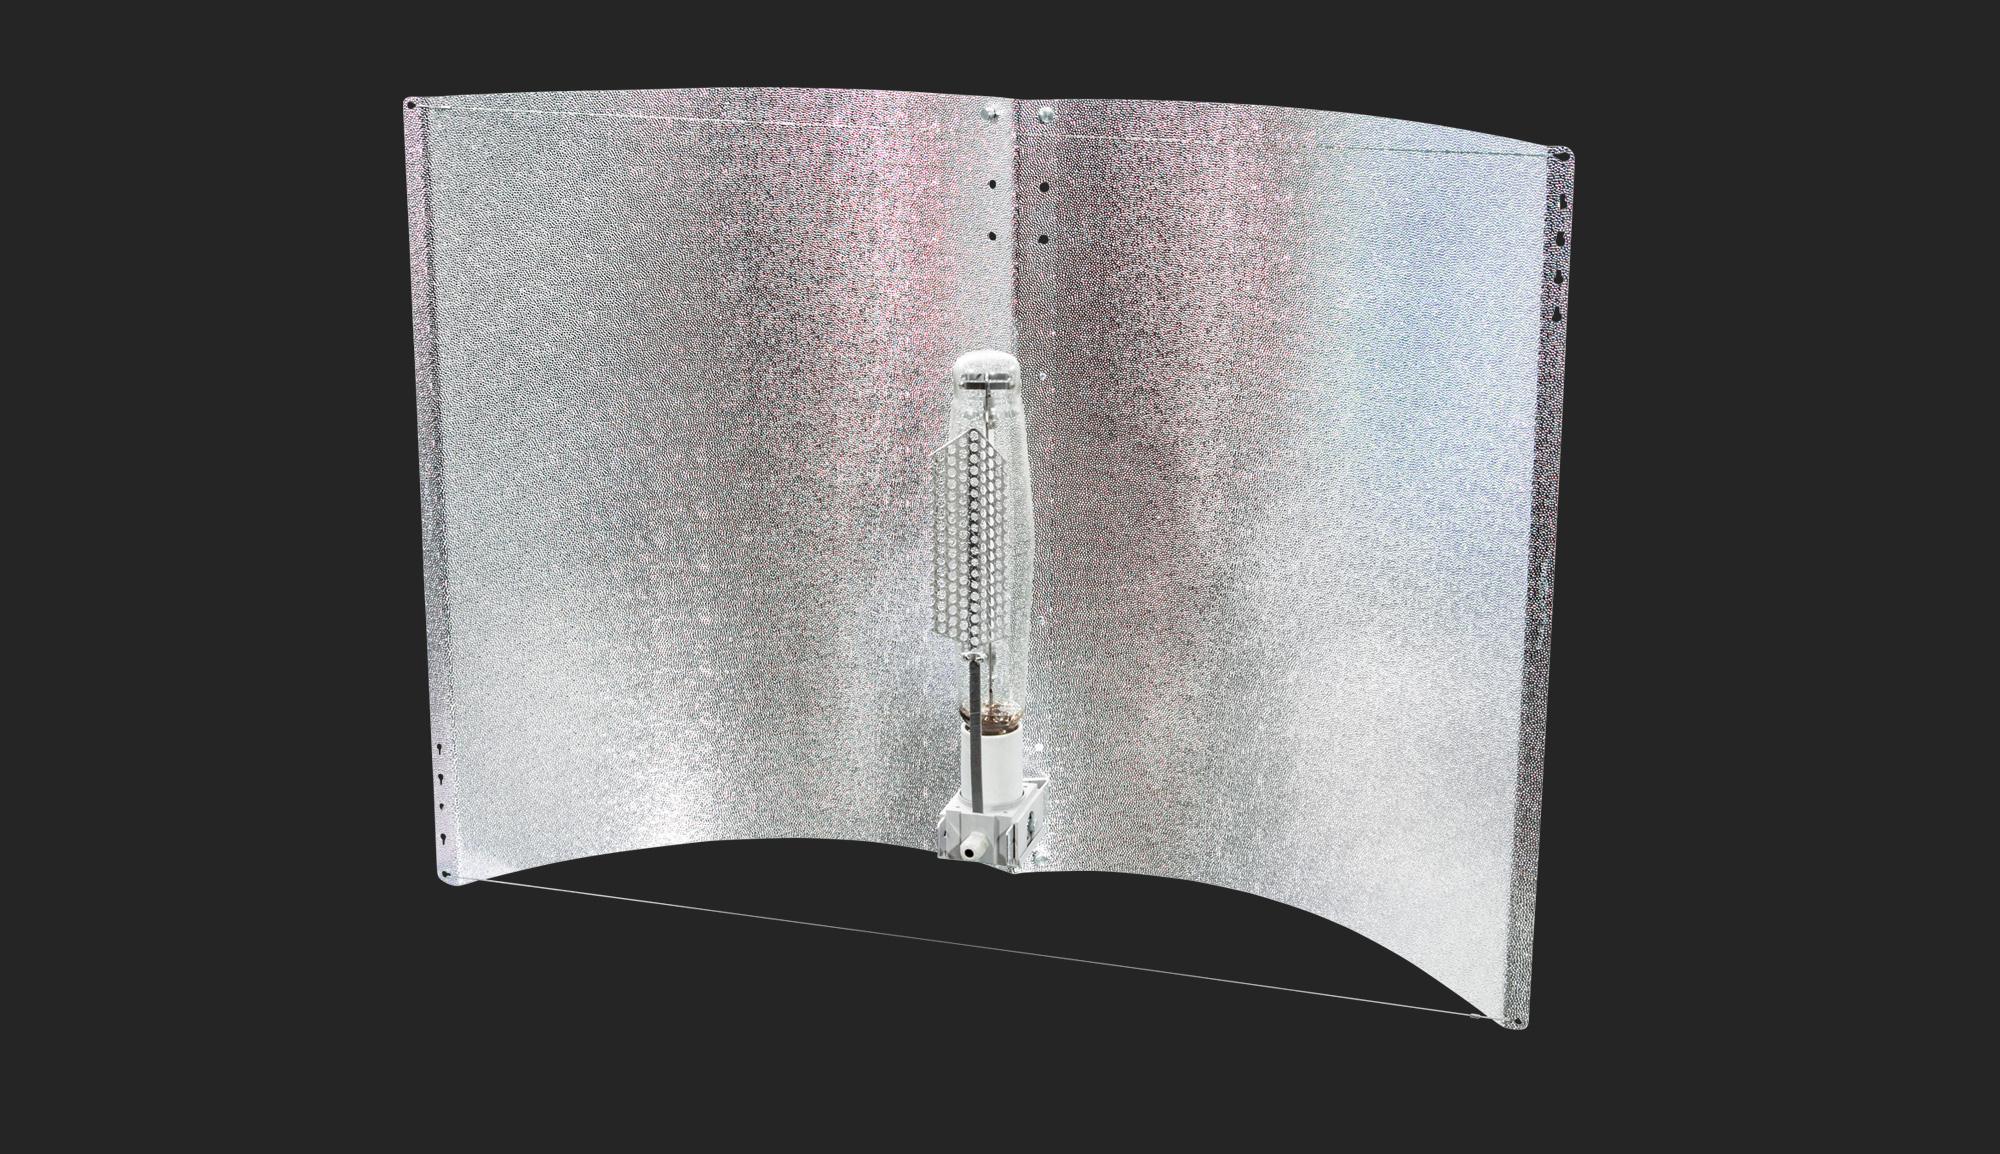 Avenger Large Reflector - Adjust-A-Wings